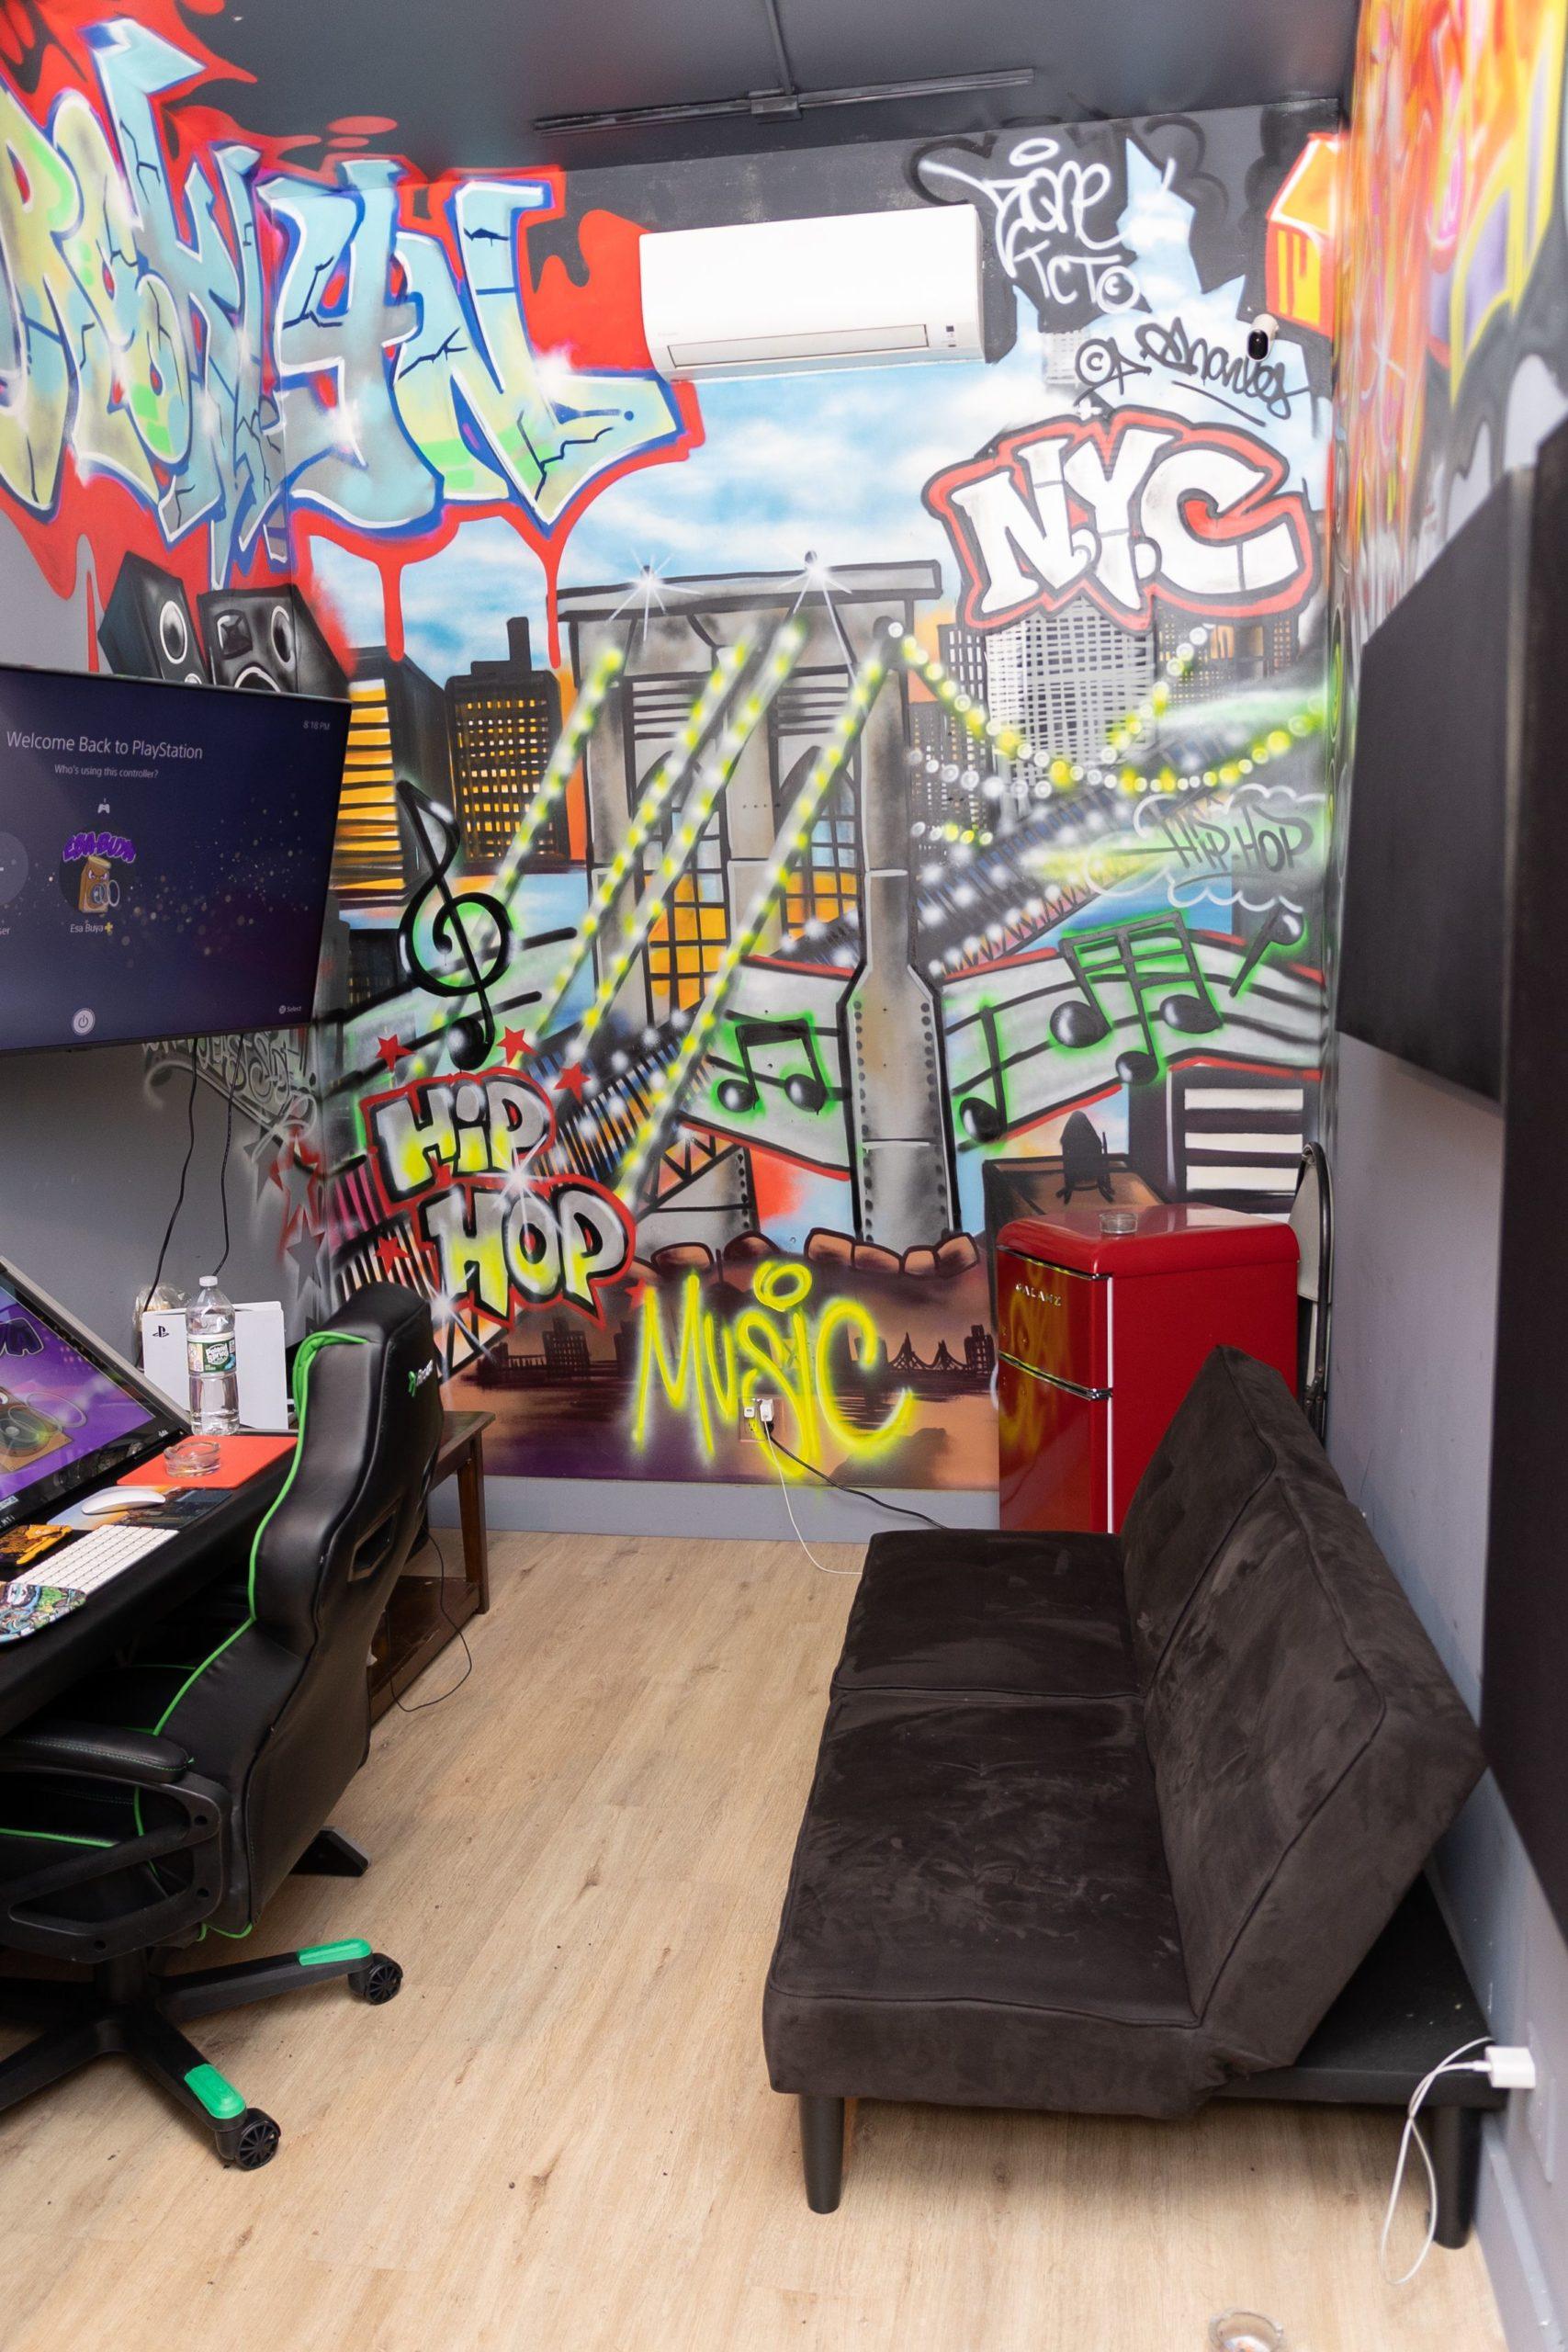 303Saints Opens Up New Recording Studio, EsaBuya in Brooklyn, NY